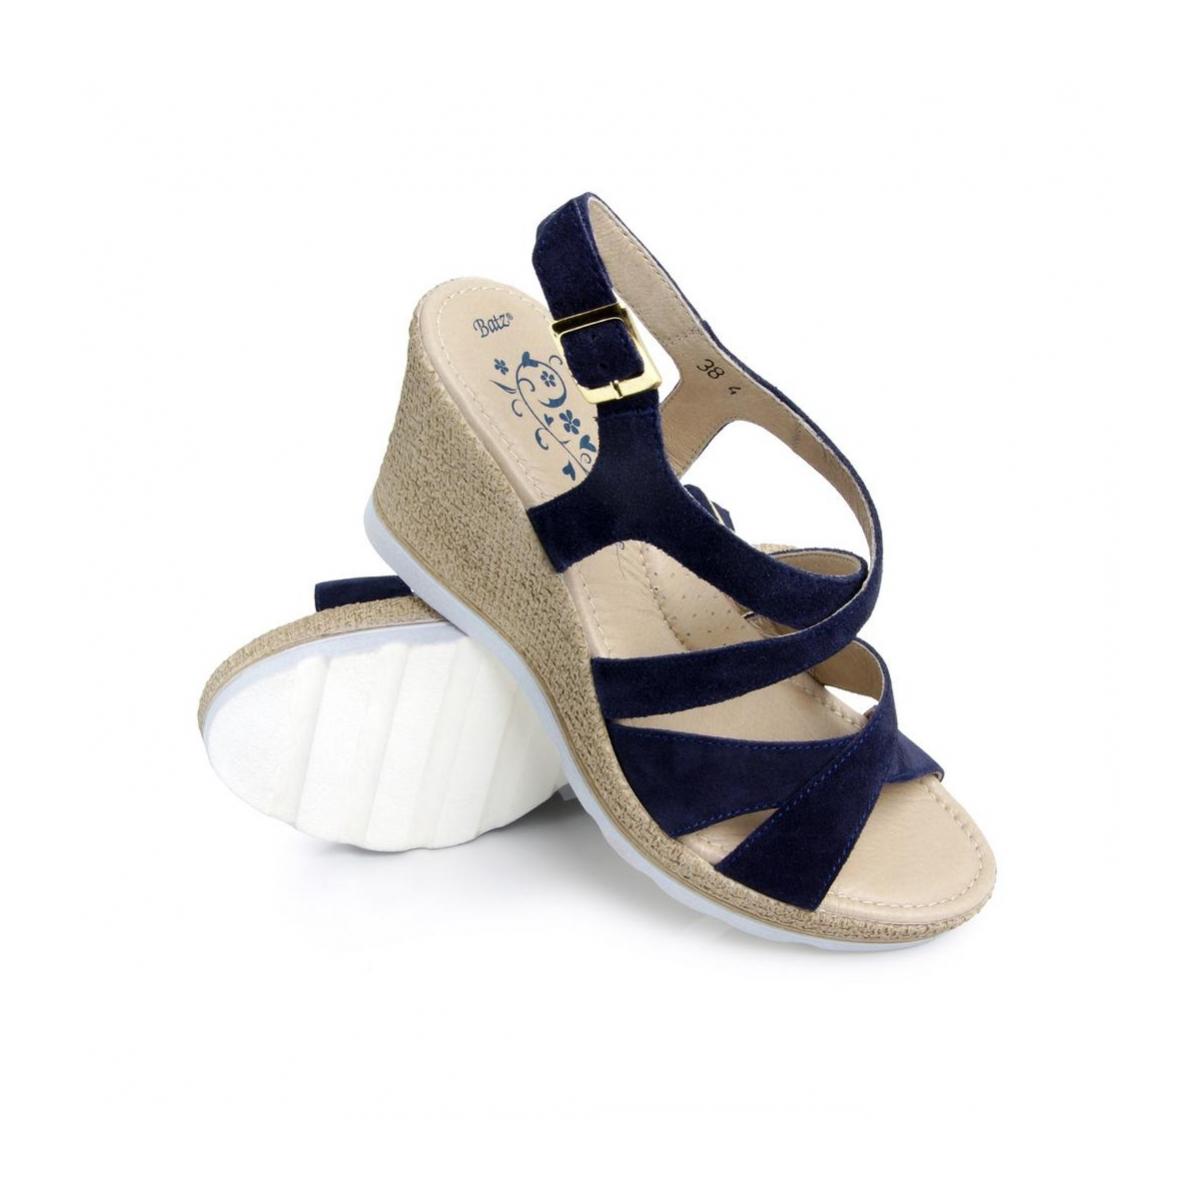 9a510fab5f Dámske kožené modré sandále LUCIA - 2